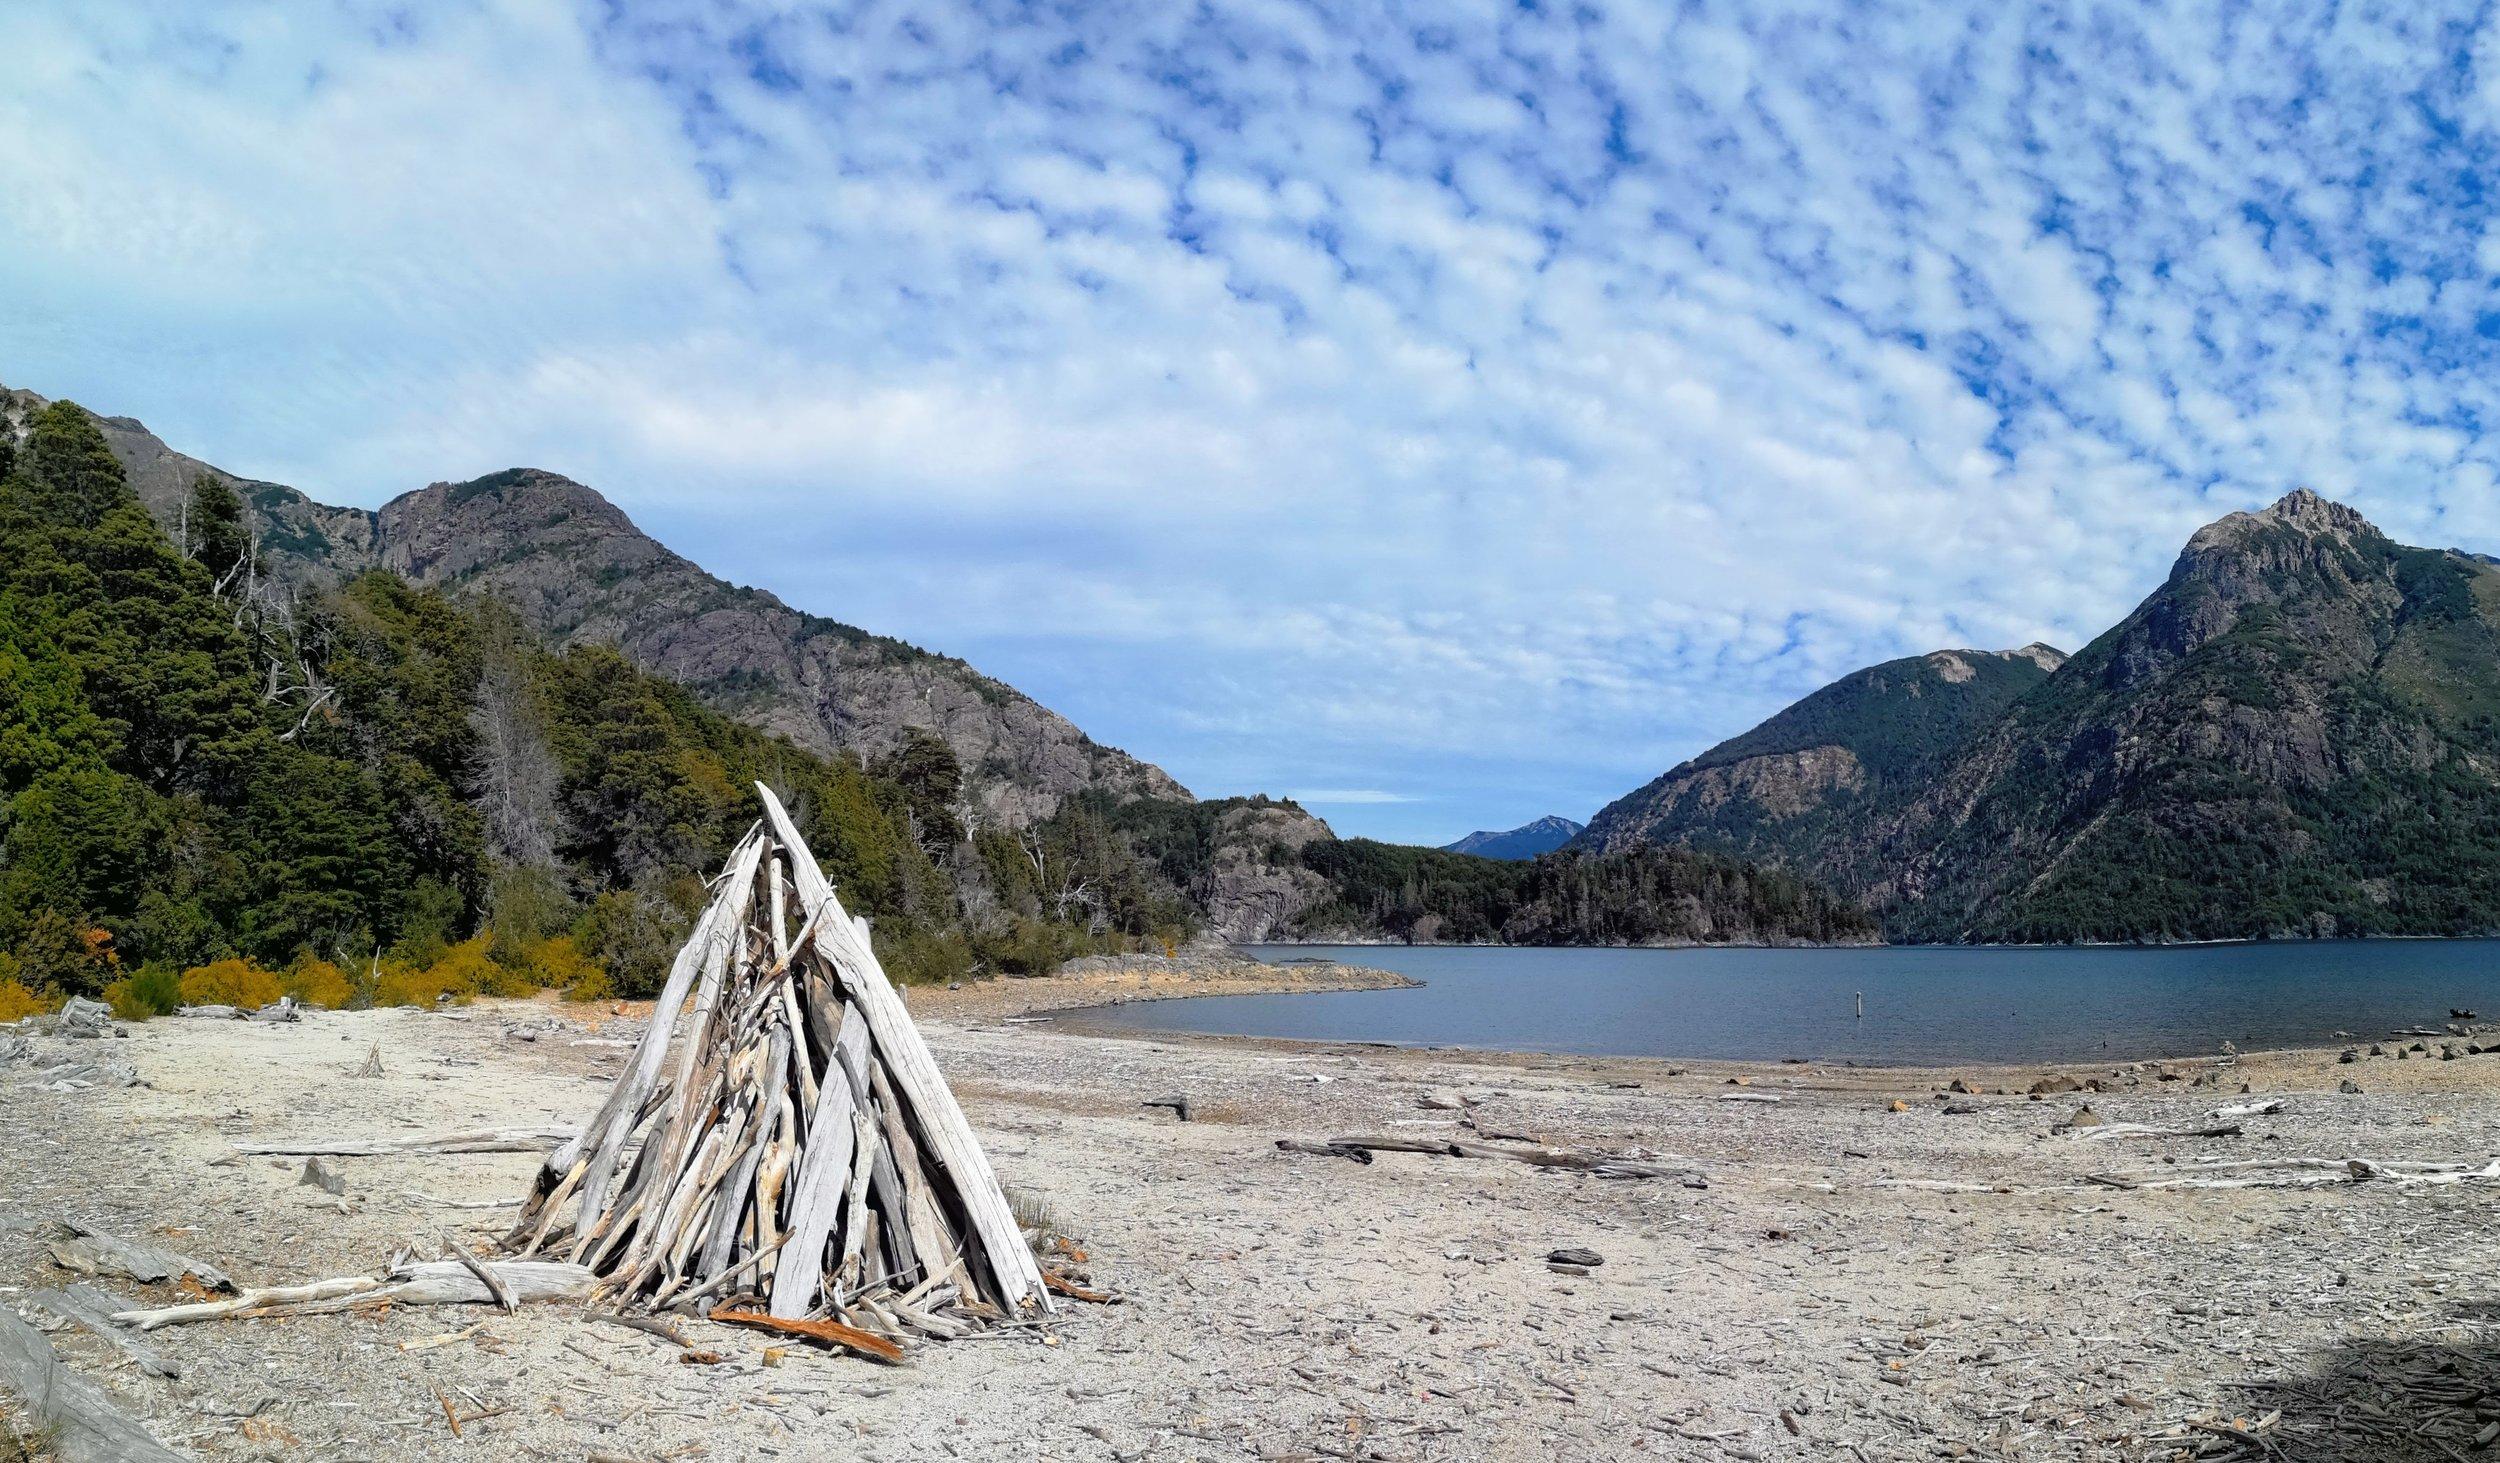 Nahuel Huapi lago lake bahia de los troncos playa beach bay of tree trunks travel photography hiking guide near bariloche trek